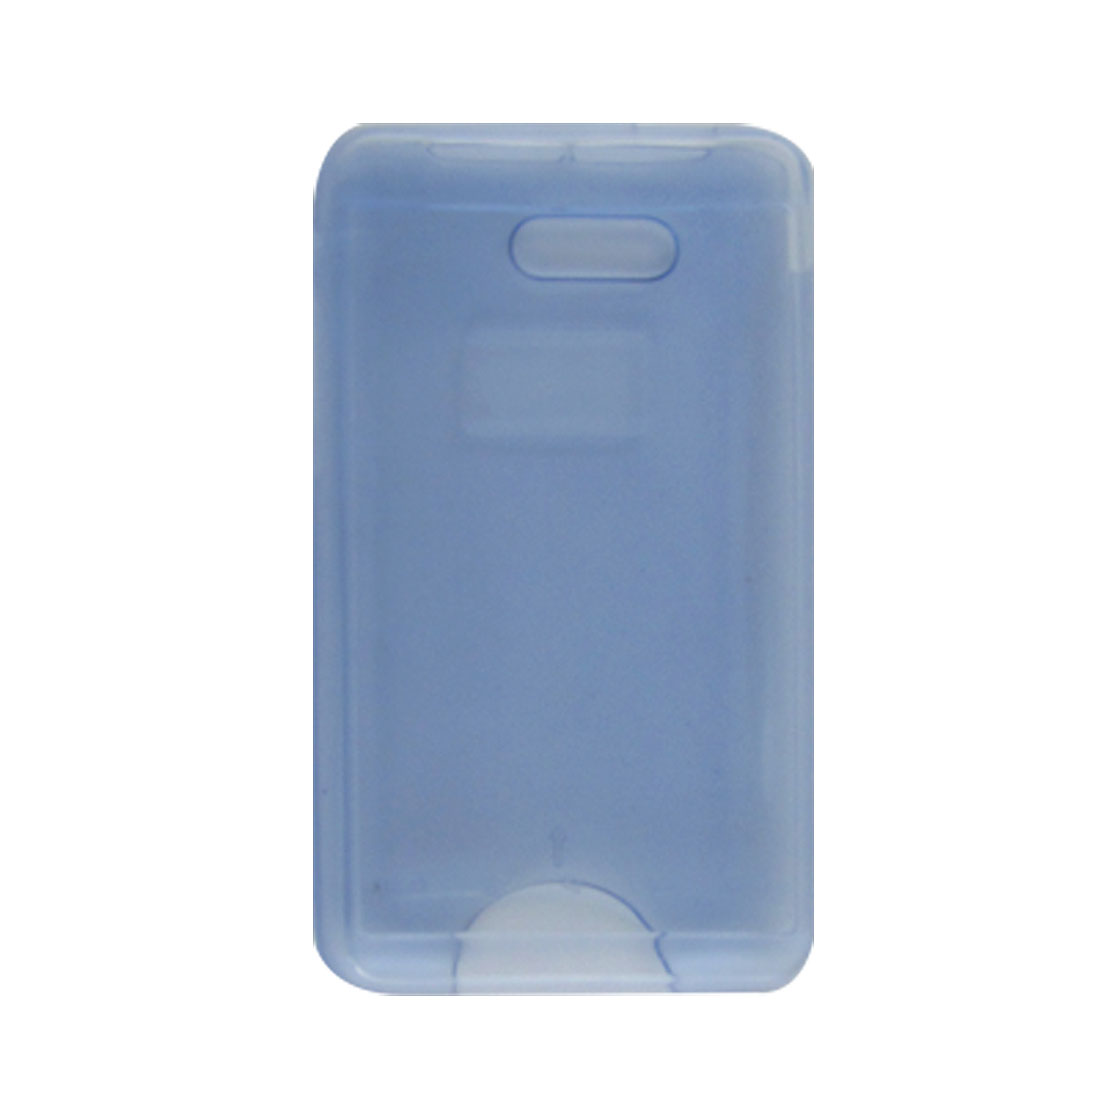 Clear Blue Soft Plastic Shield Guard Cover for HTC HD Mini